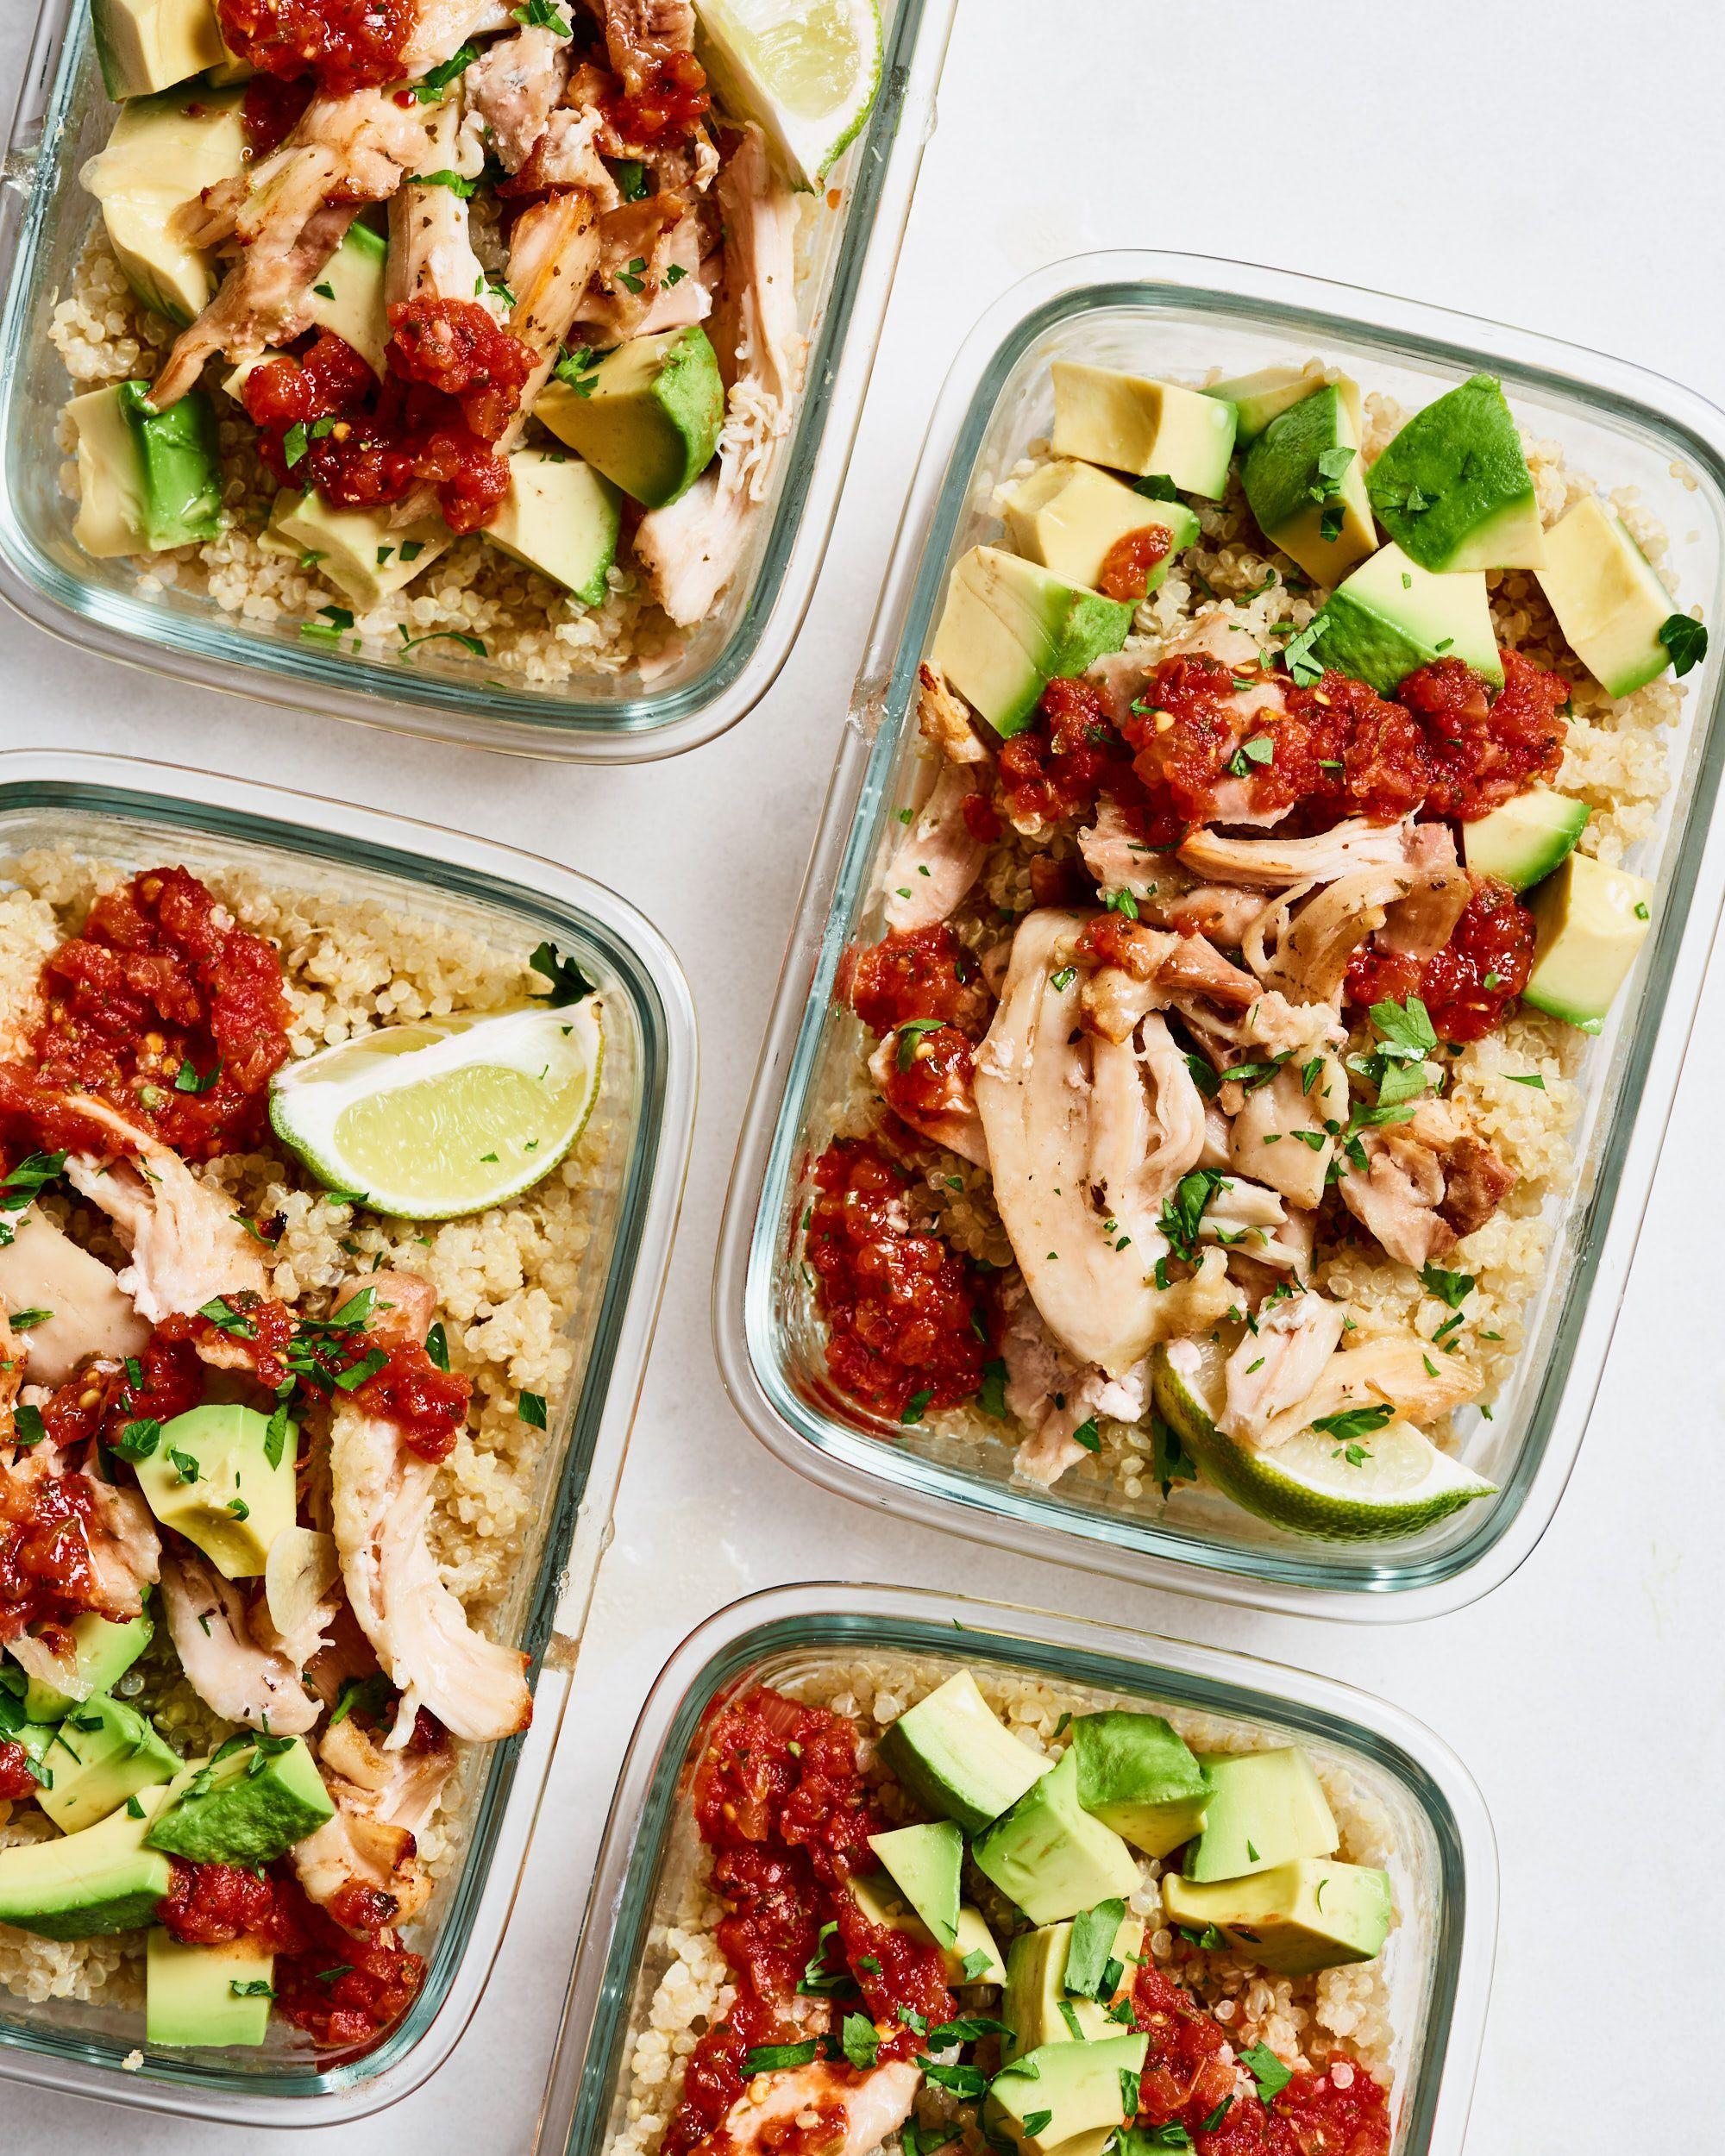 Meal Prep Plan: A Week of Gluten-Free Meals in Under Two Hours #mealprepplans